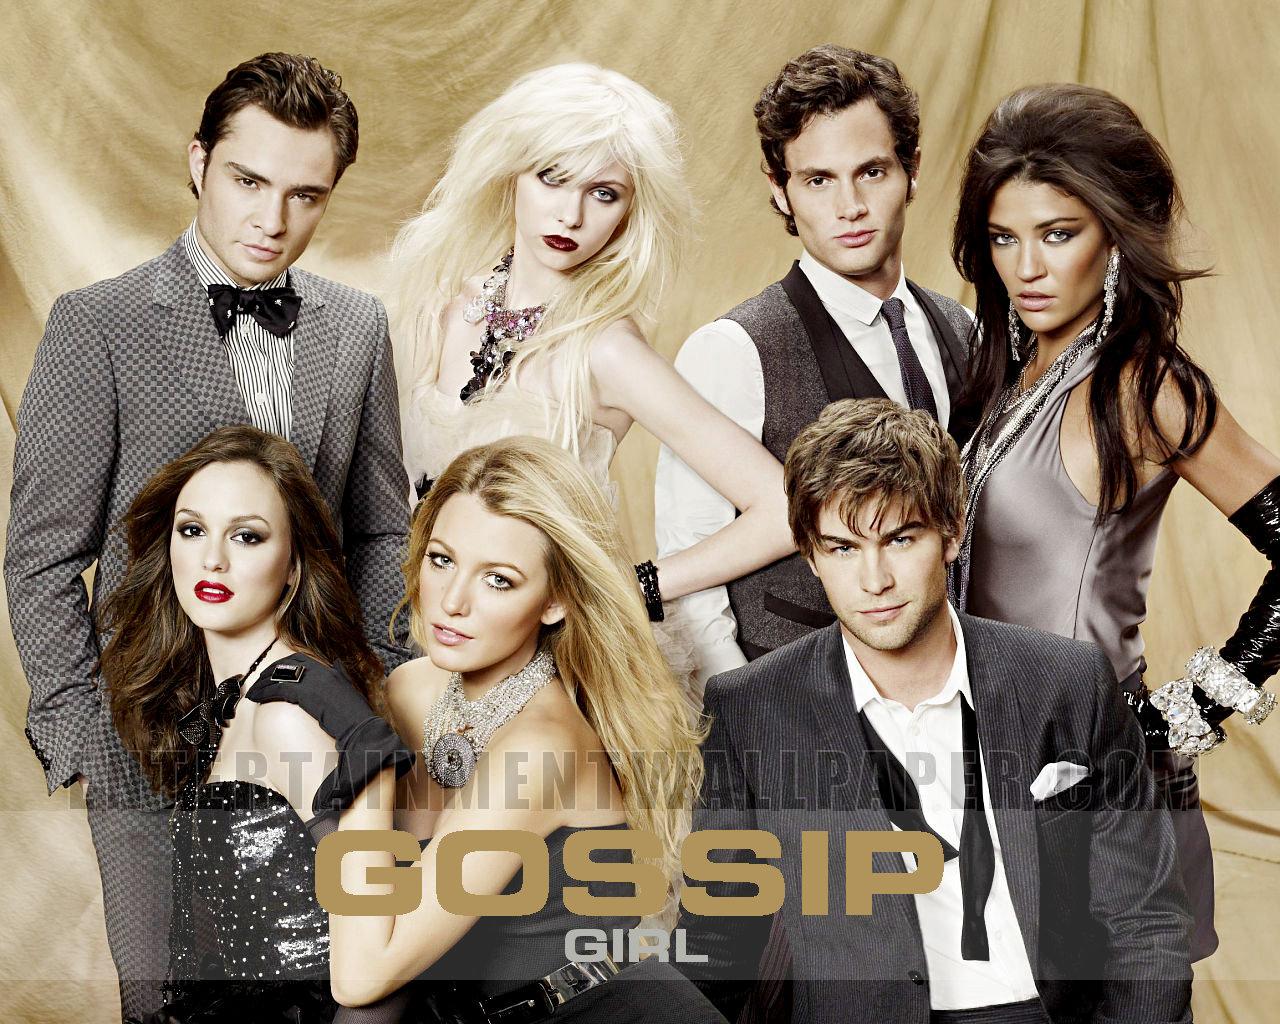 I'm Chuck Bass: Gossip Girl Brings Reality With Elegence ...